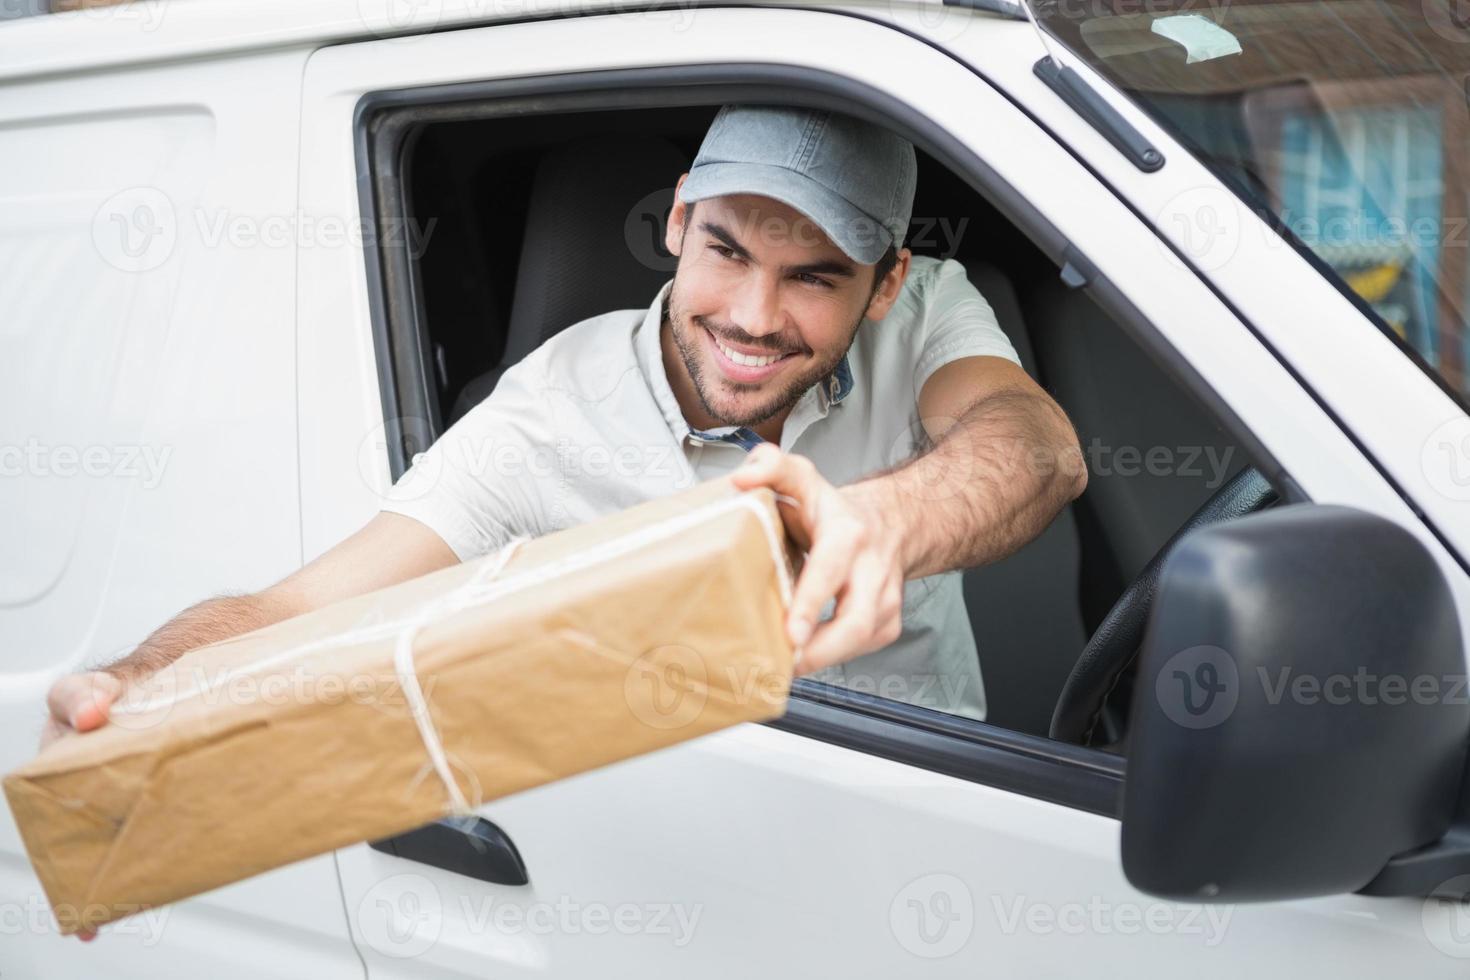 motorista de entrega oferecendo pacote de sua van foto